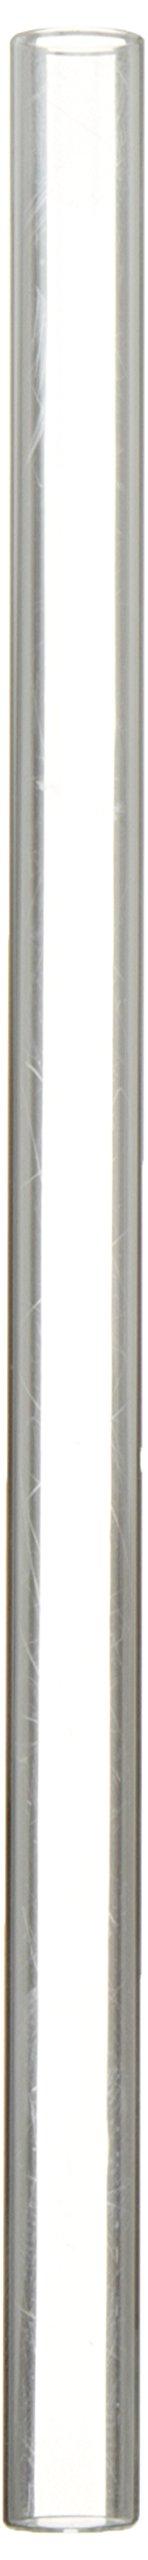 Kimble 897300-0000 Borosilicate Glass Disposable Grade Flat Bottom NMR Tubes without Caps, 0.394'' Diameter, 7'' Length (Case of 50)